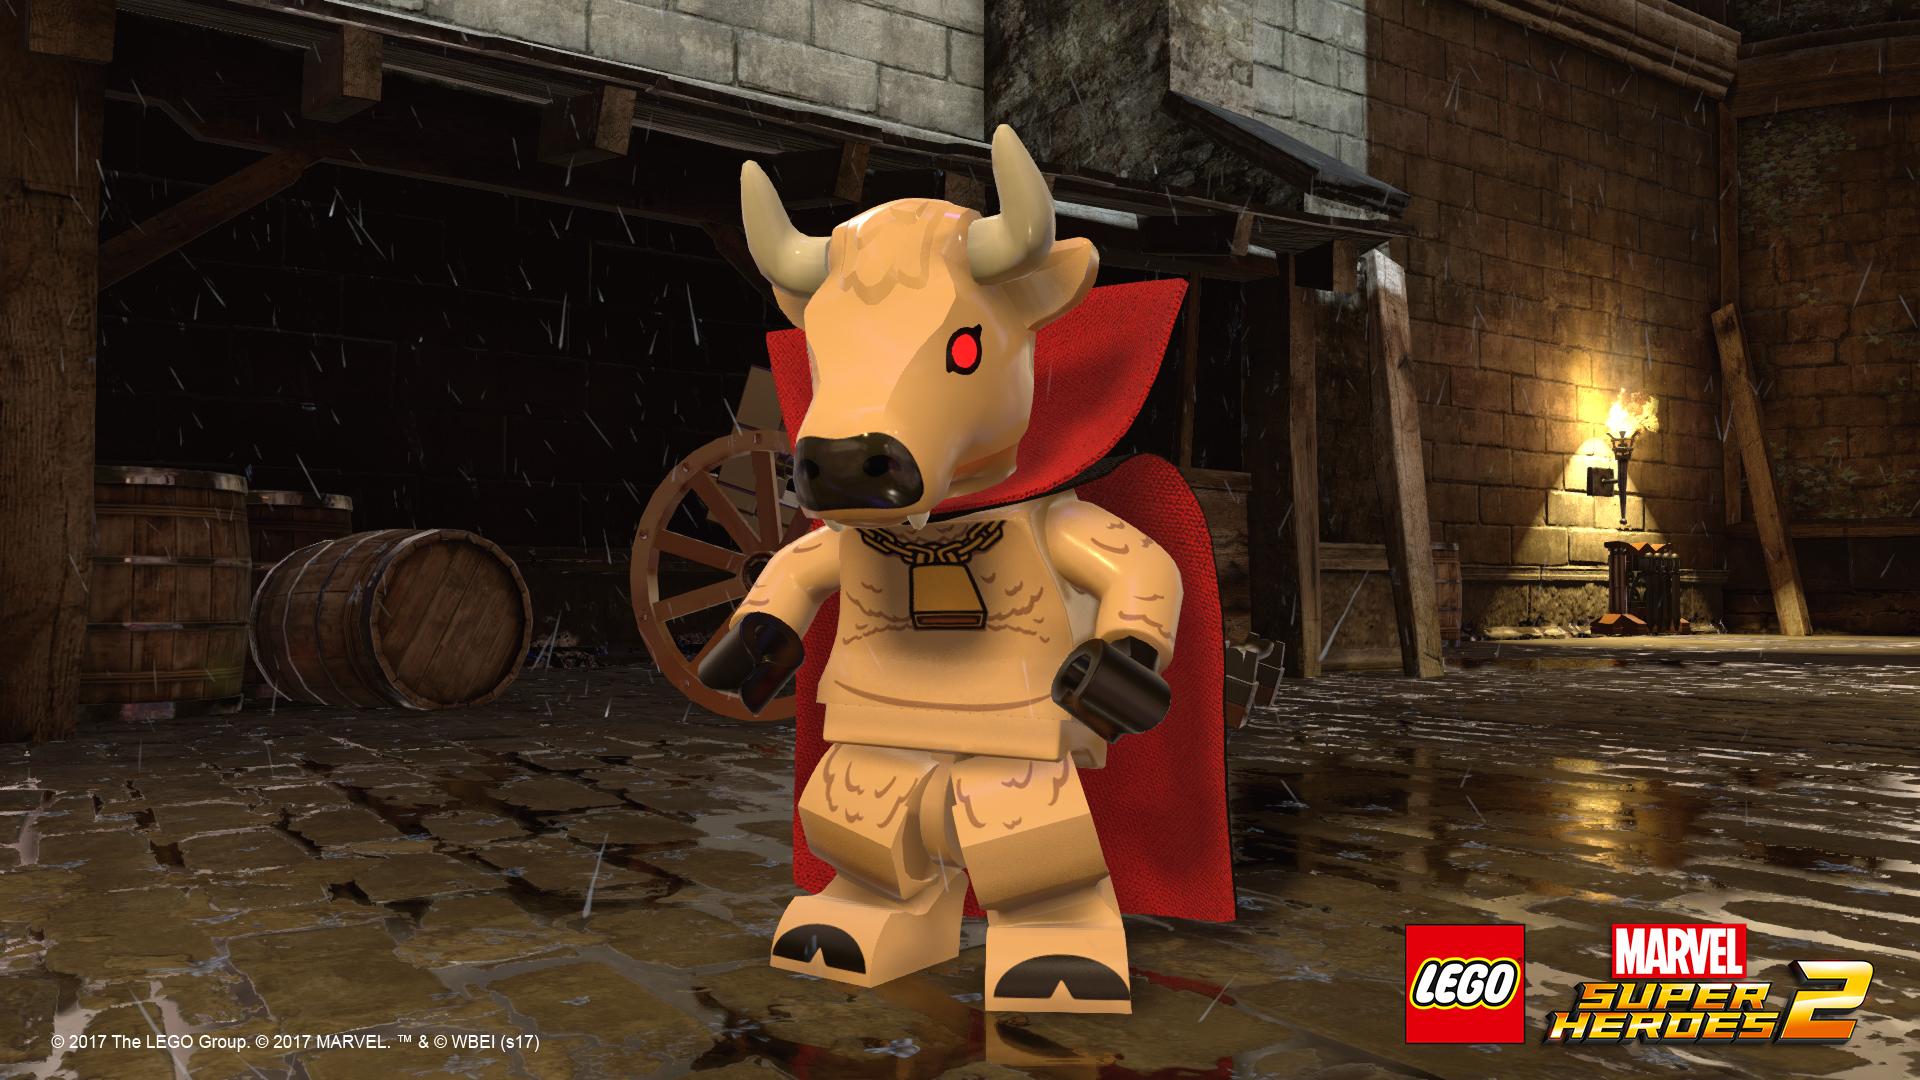 LEGO_Marvel_Super_Heroes_2_-_Hellcow_1507794992